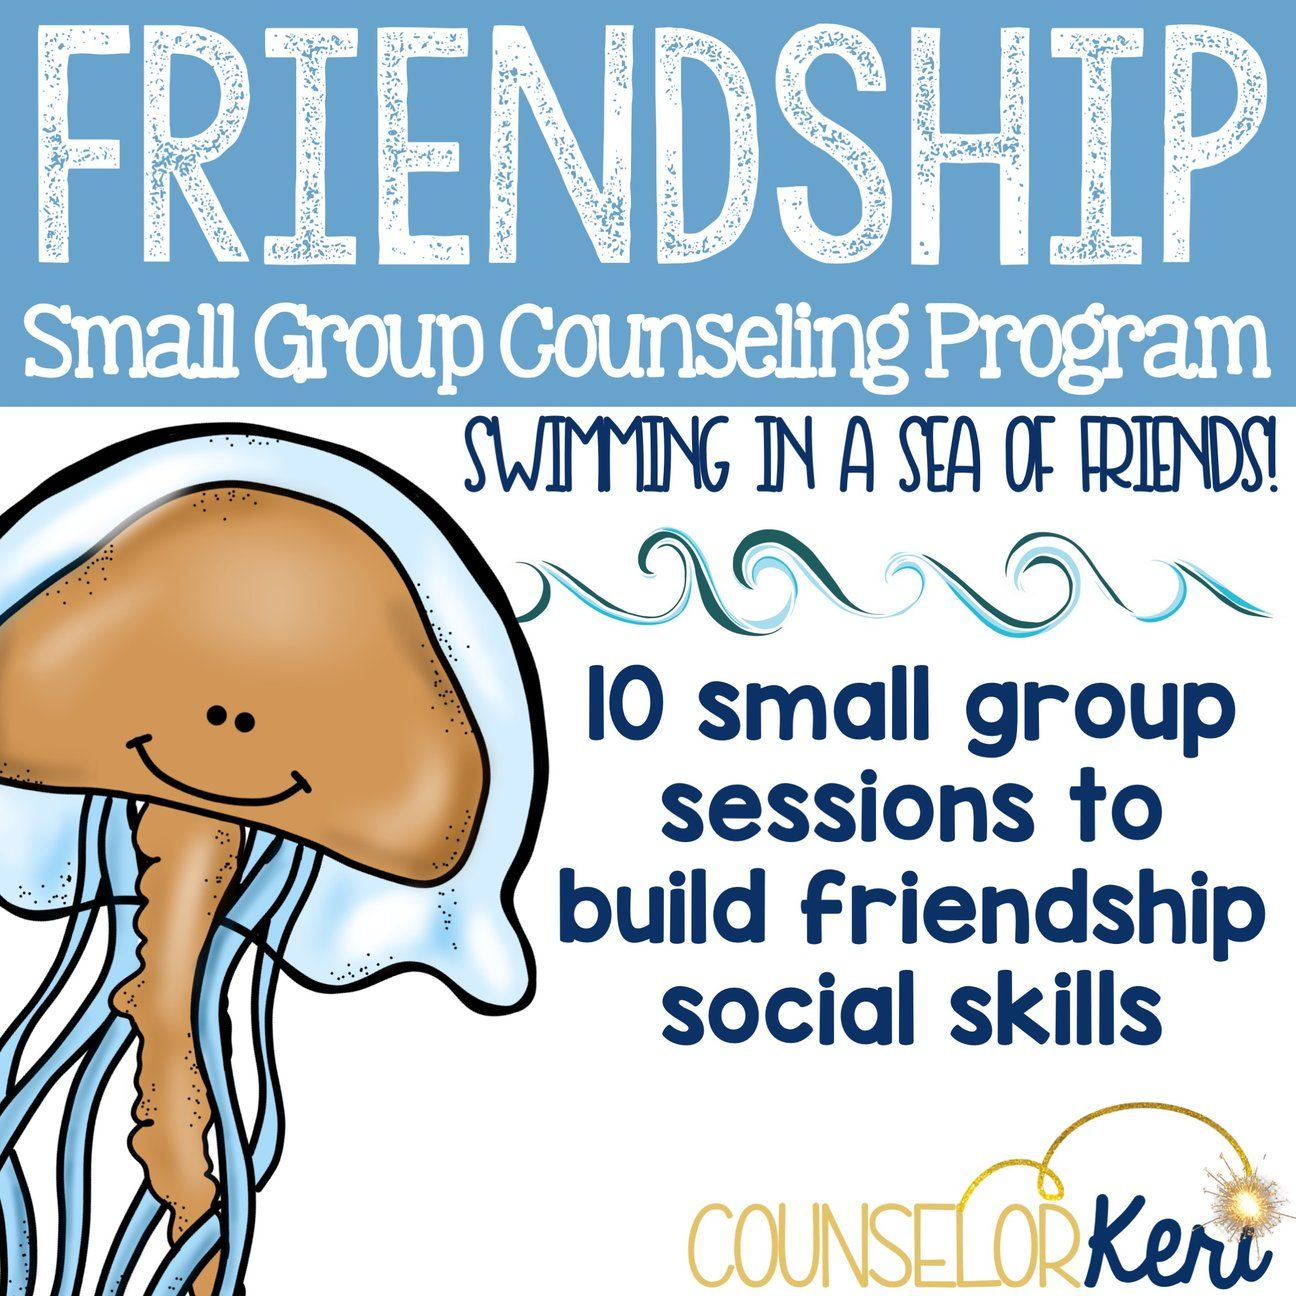 Friendship Social Skills Group Counseling Program